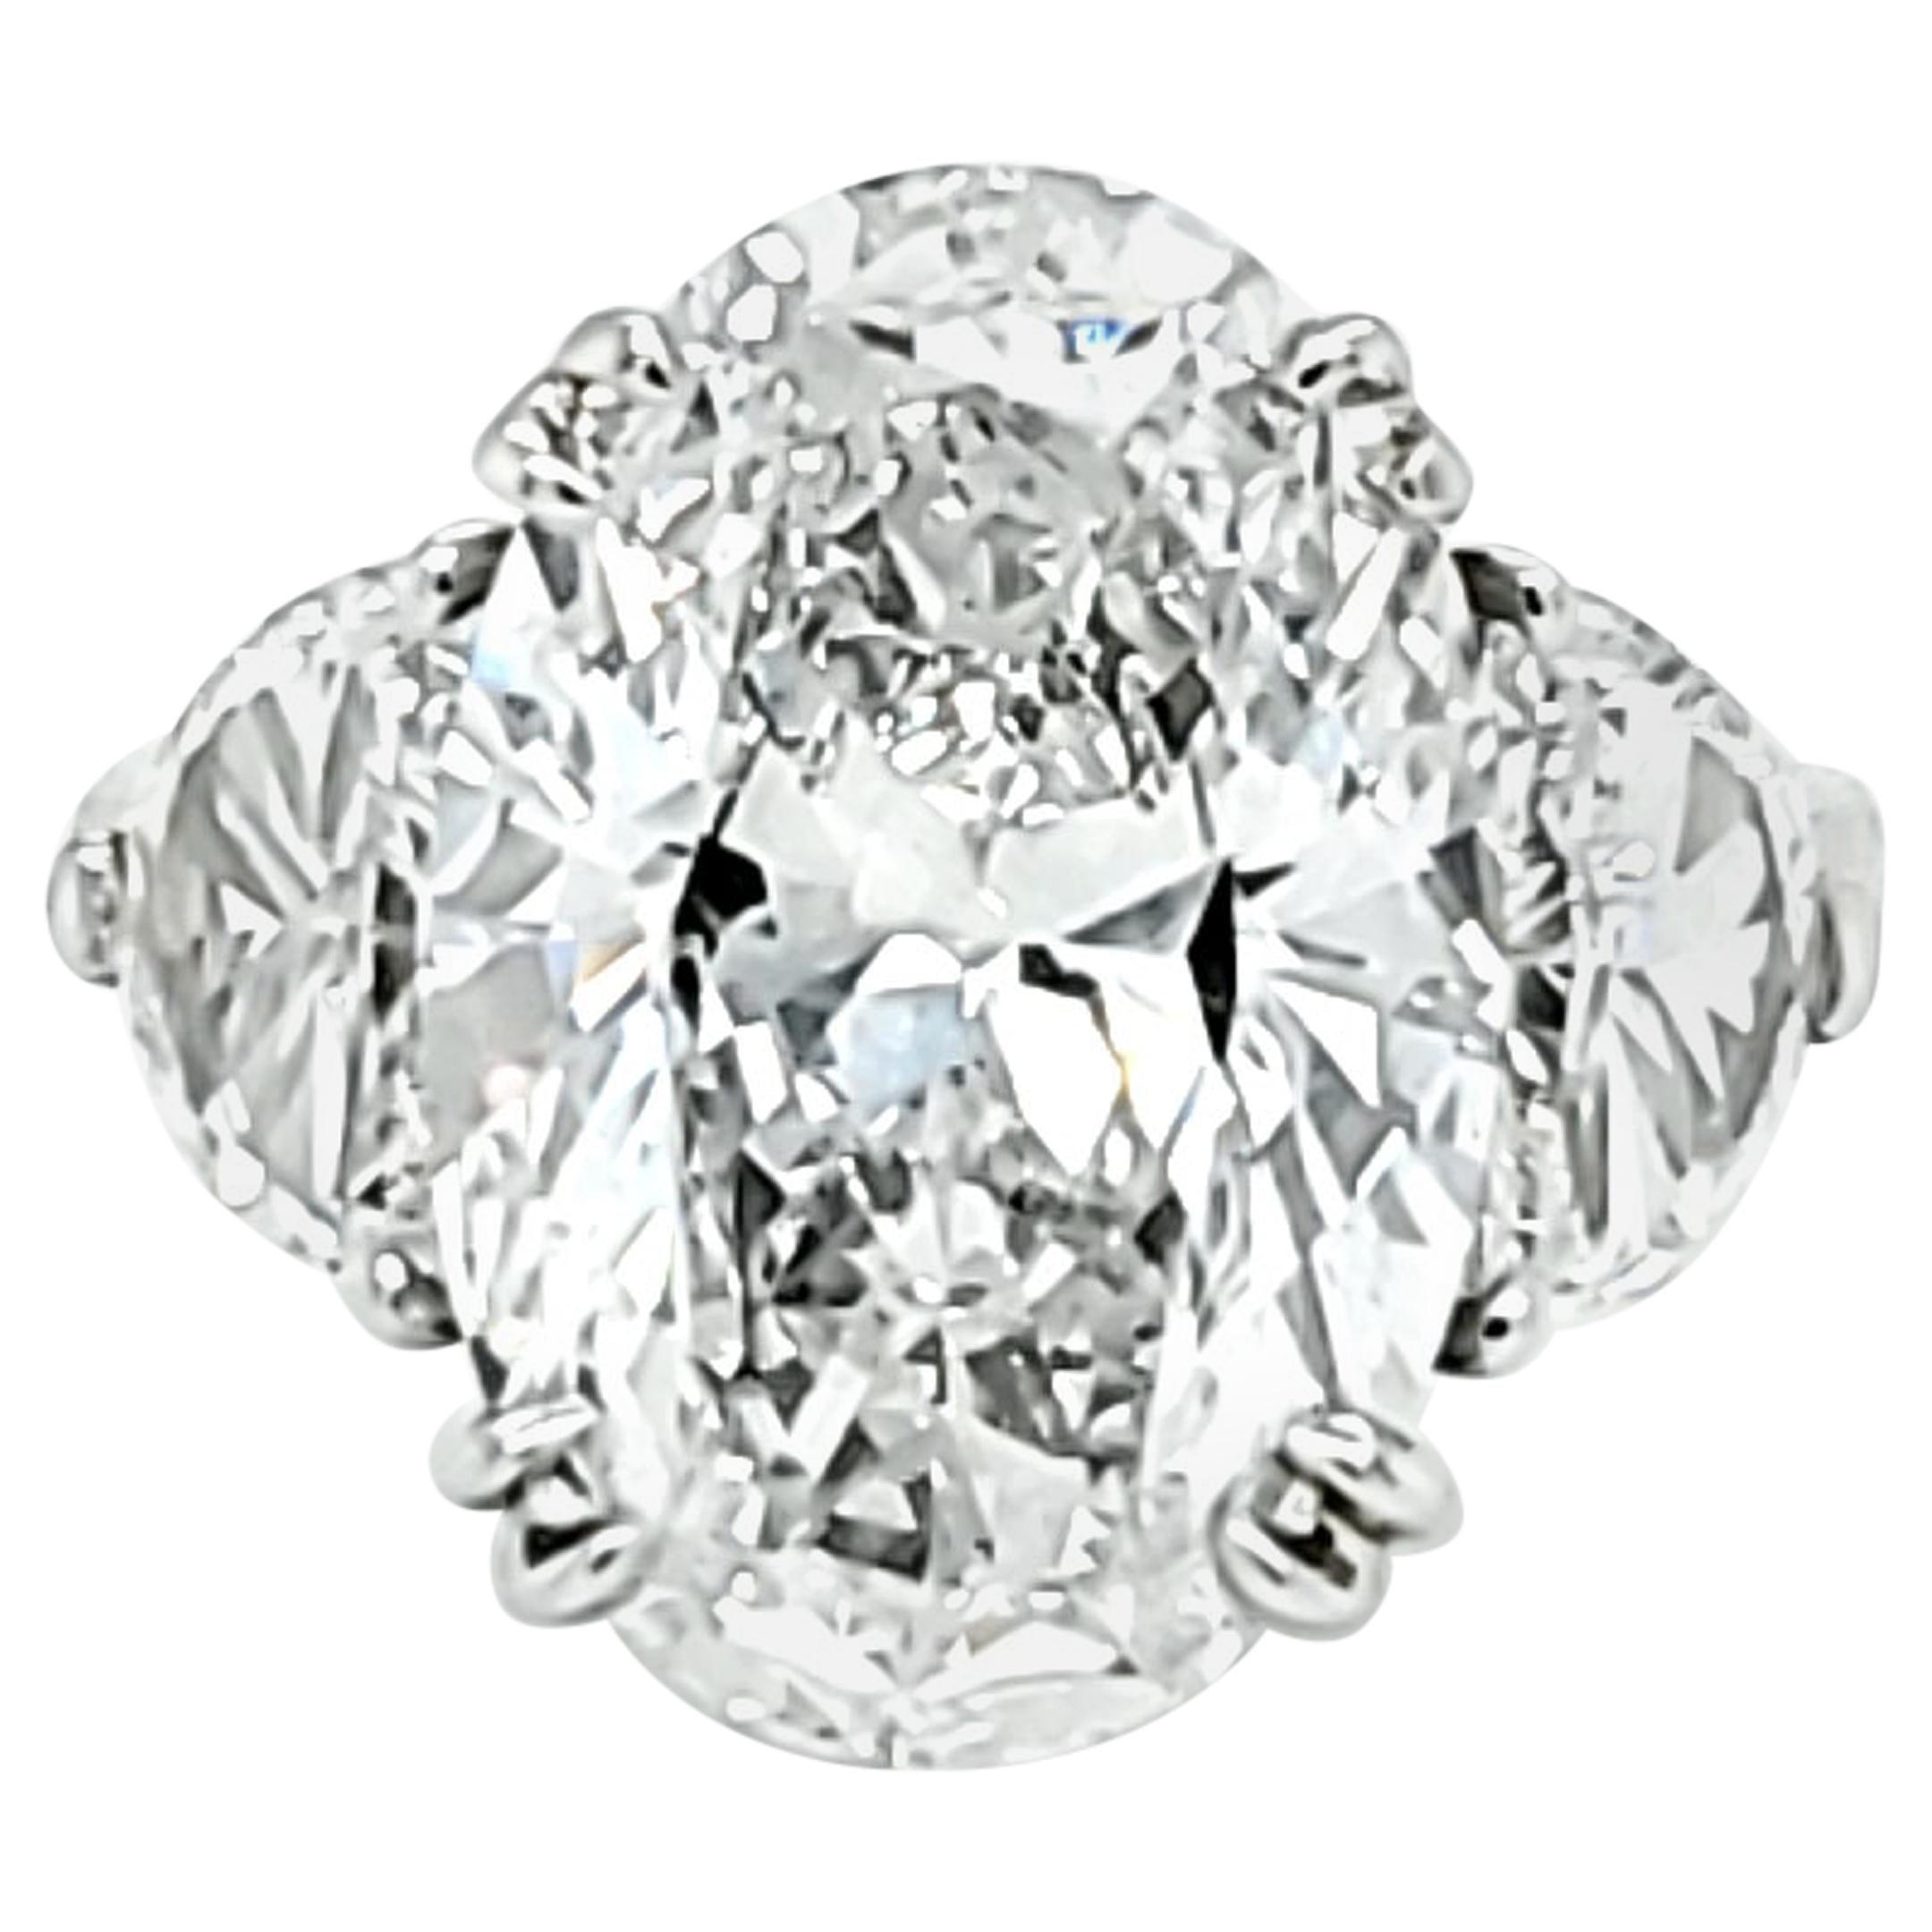 GIA Certified 6.16 Carat Oval Cut Diamond Three-Stone Ring